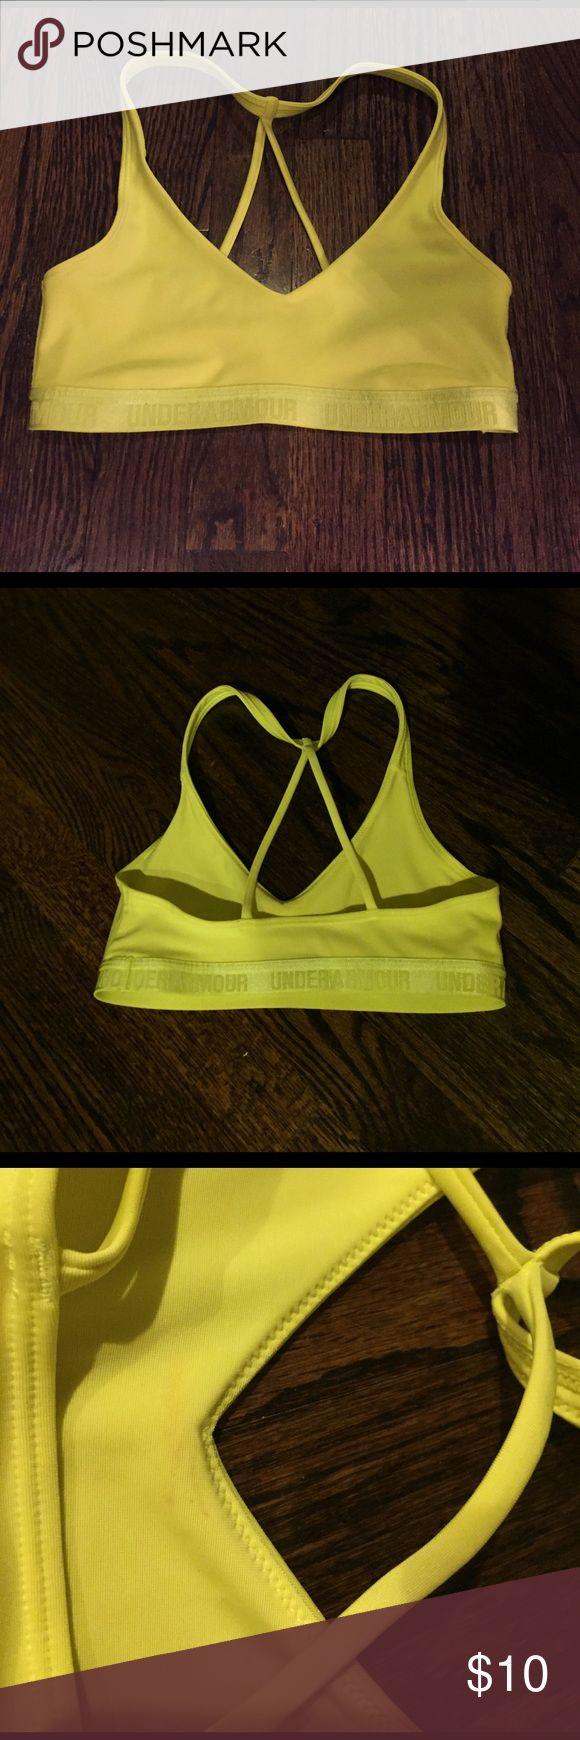 Under Armour Women's Sports Bra Women's Under Armour neon yellow sports bra strappy size XS Never worn, has small stain on inside, NWOT Under Armour Intimates & Sleepwear Bras